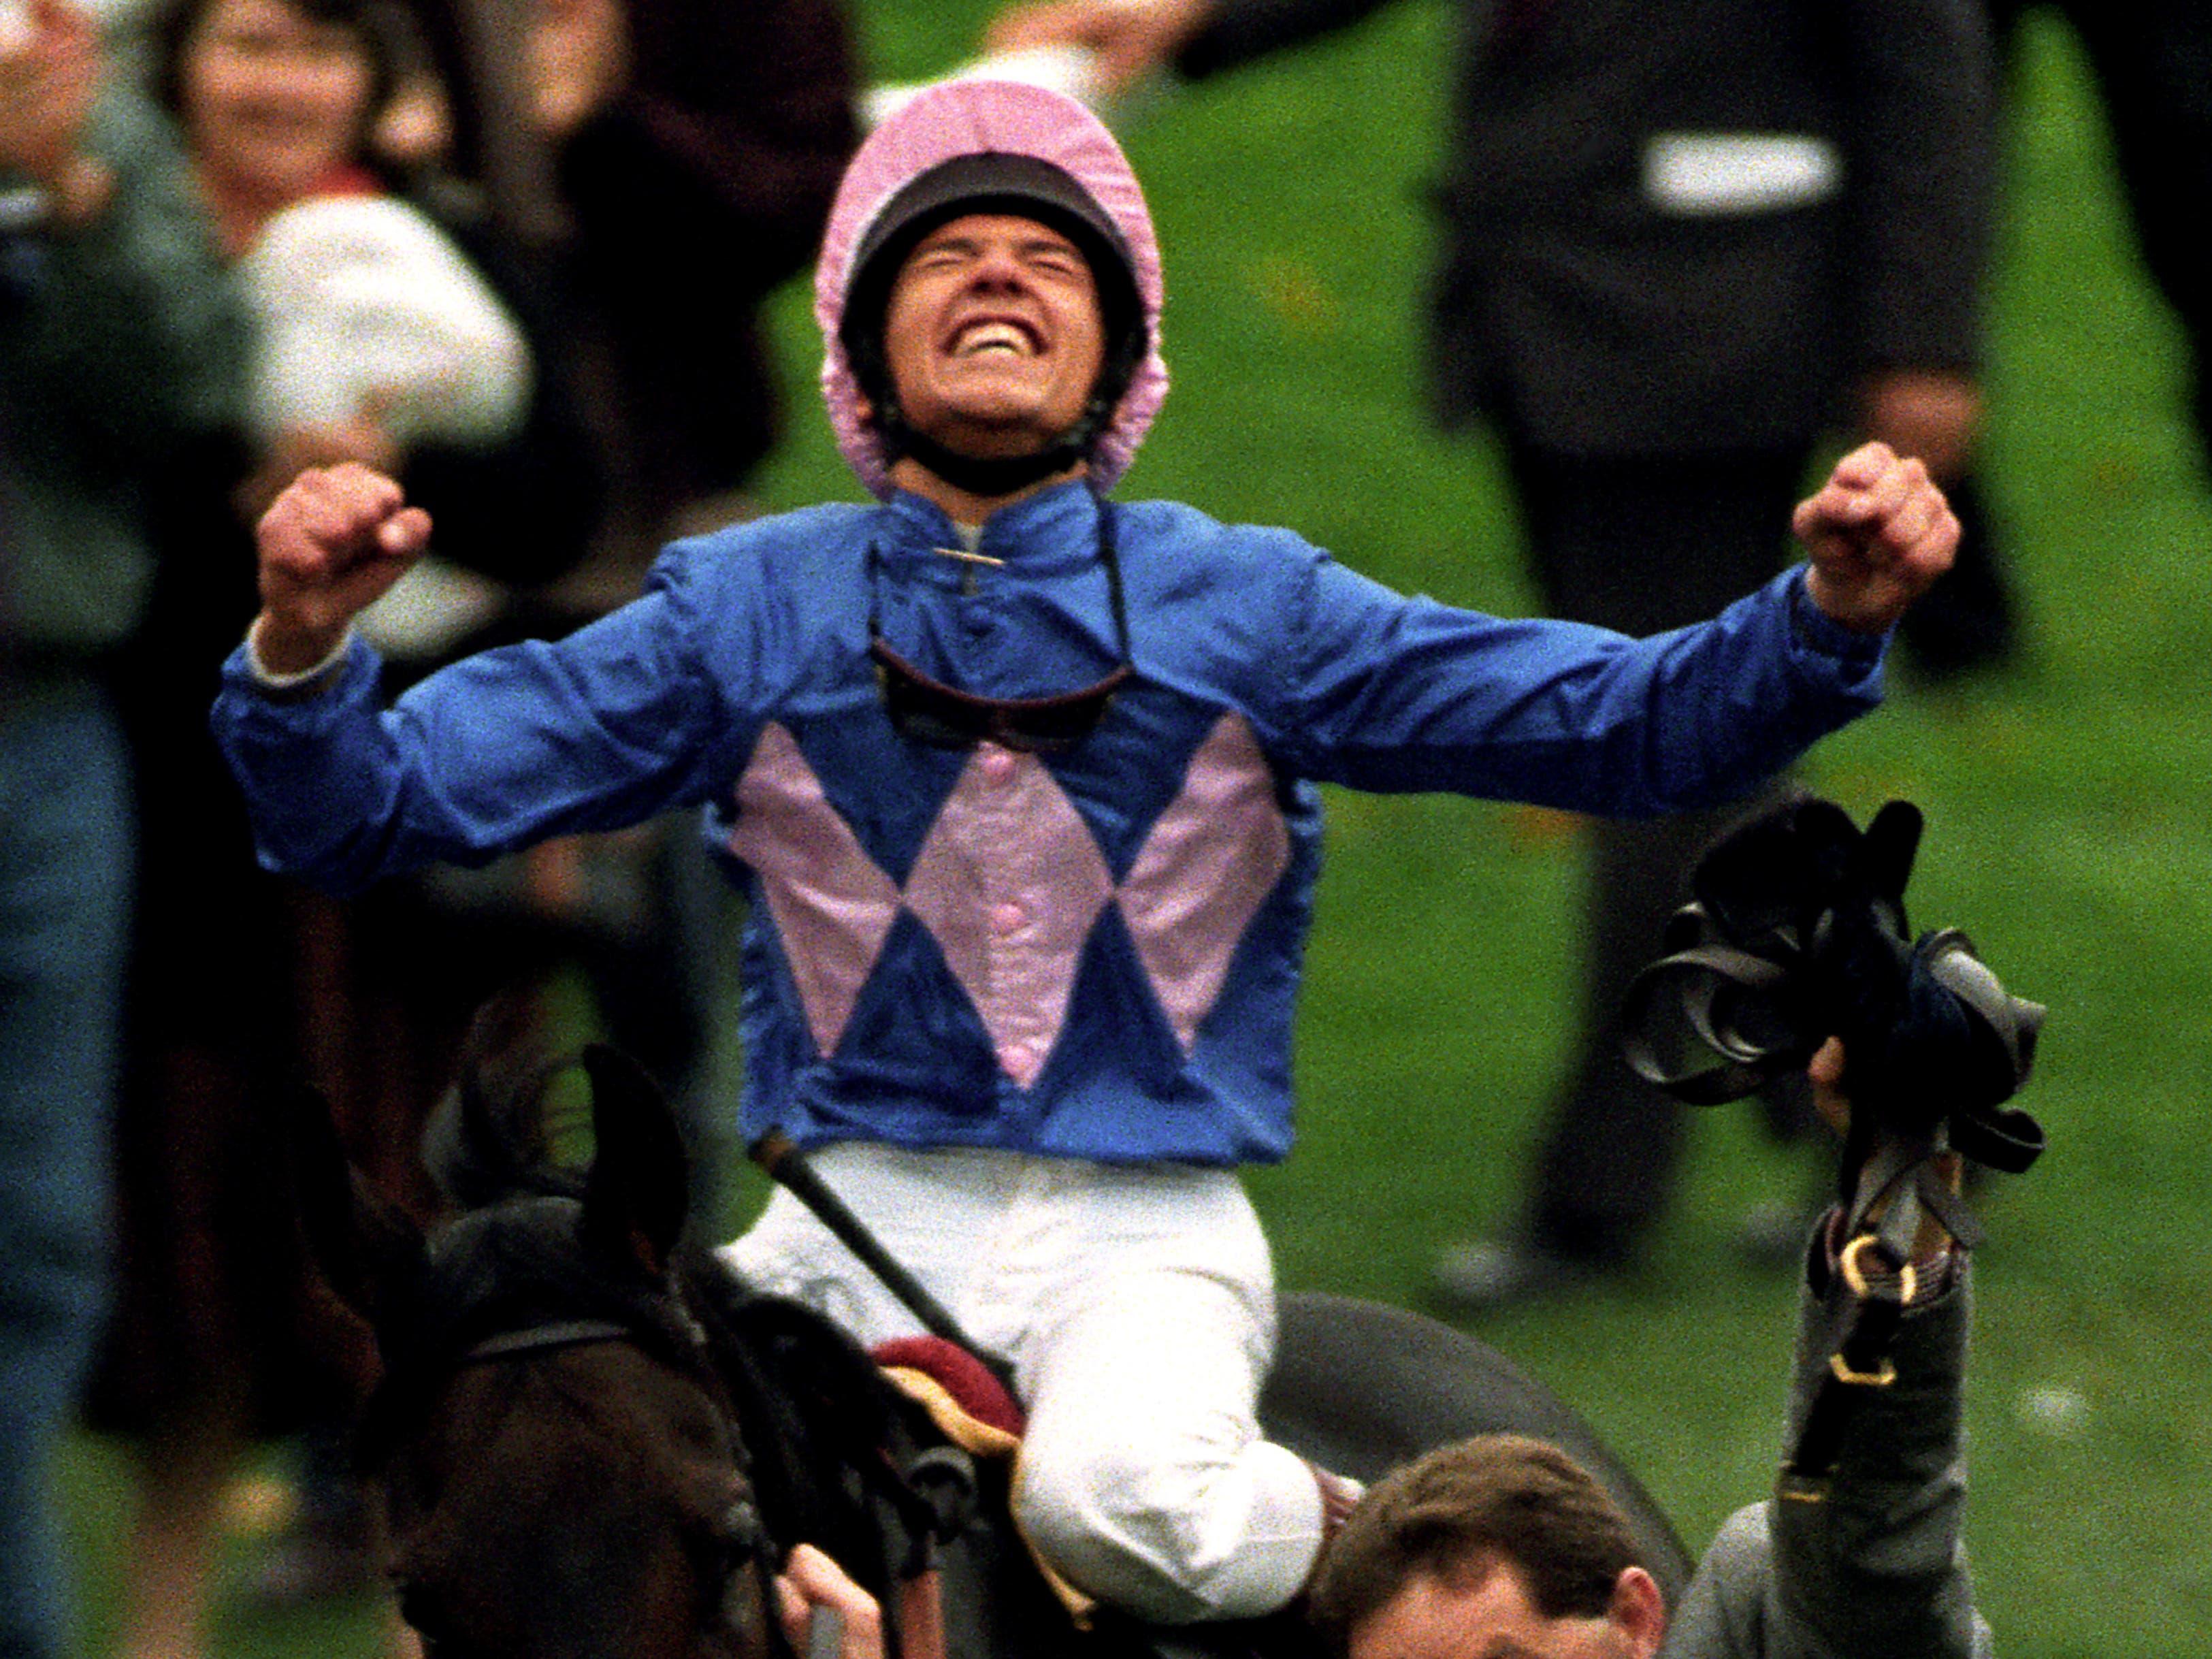 Frankie Dettori celebrates on Fujiyama Crest, the last leg of his 'Magnificent Seven' (Adam Butler/PA)